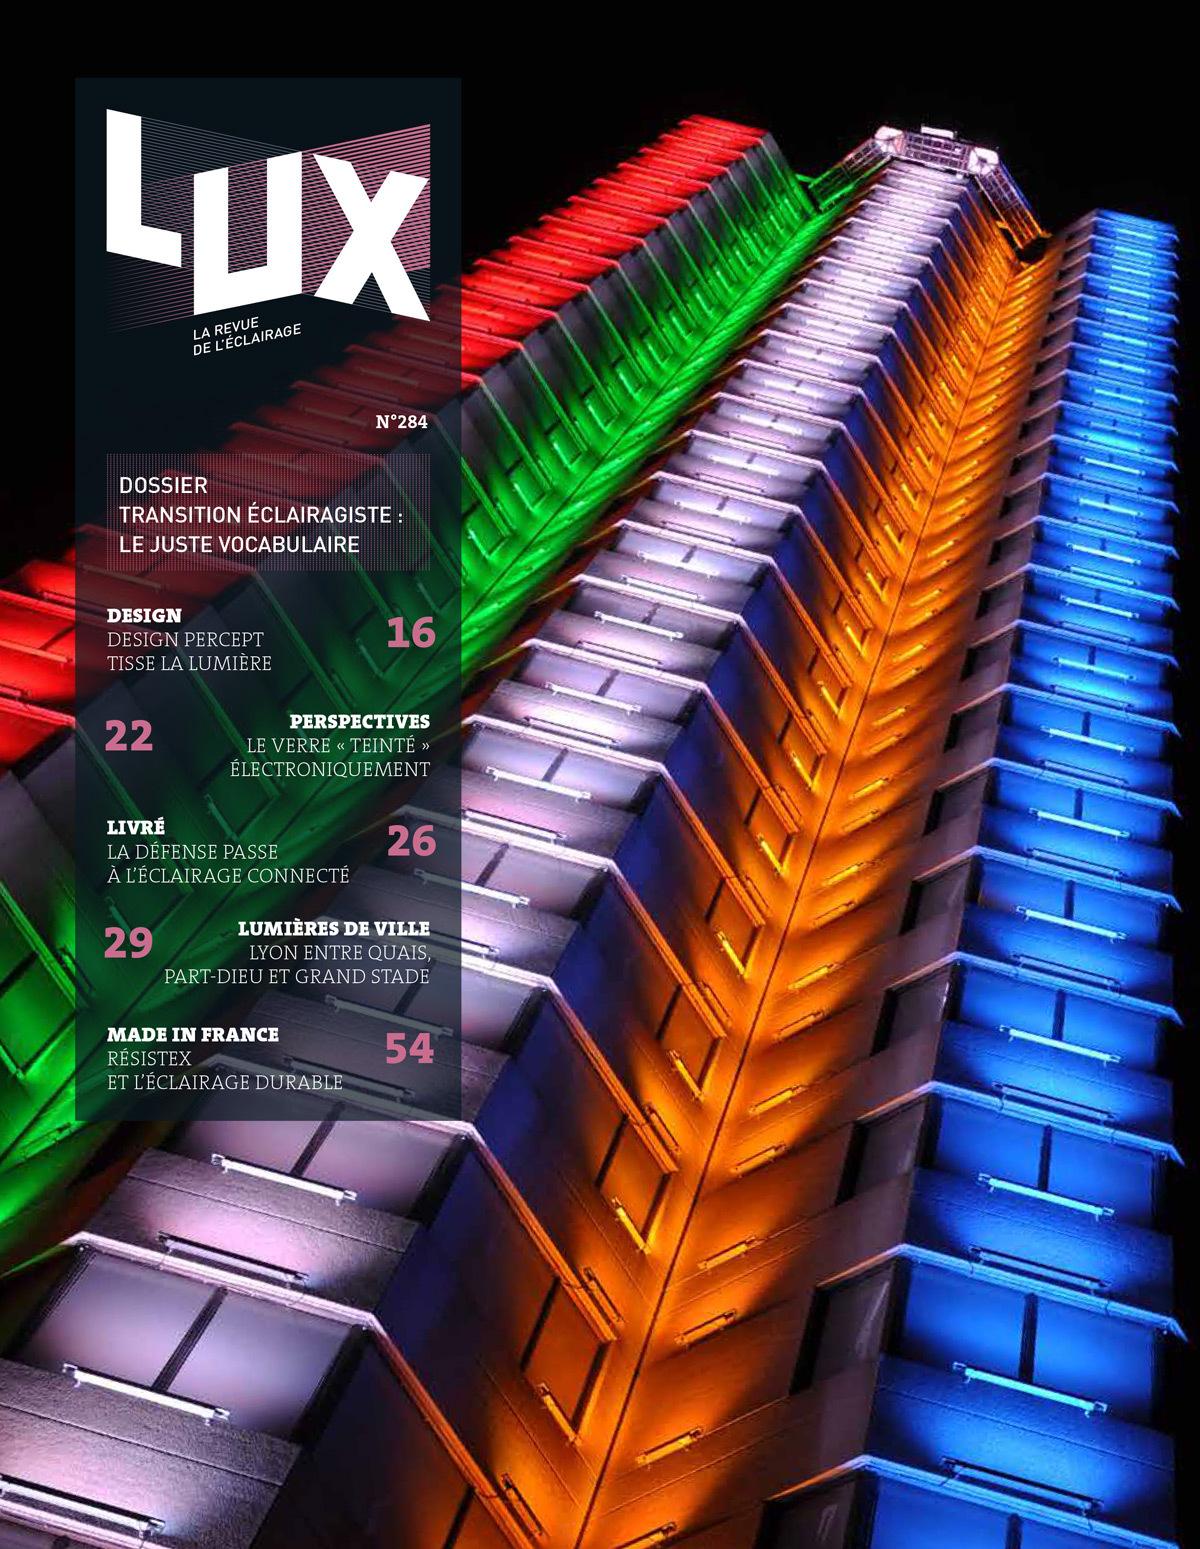 LUX-revue-de-l-eclairage-Novembre-2015-numero-284-couverture